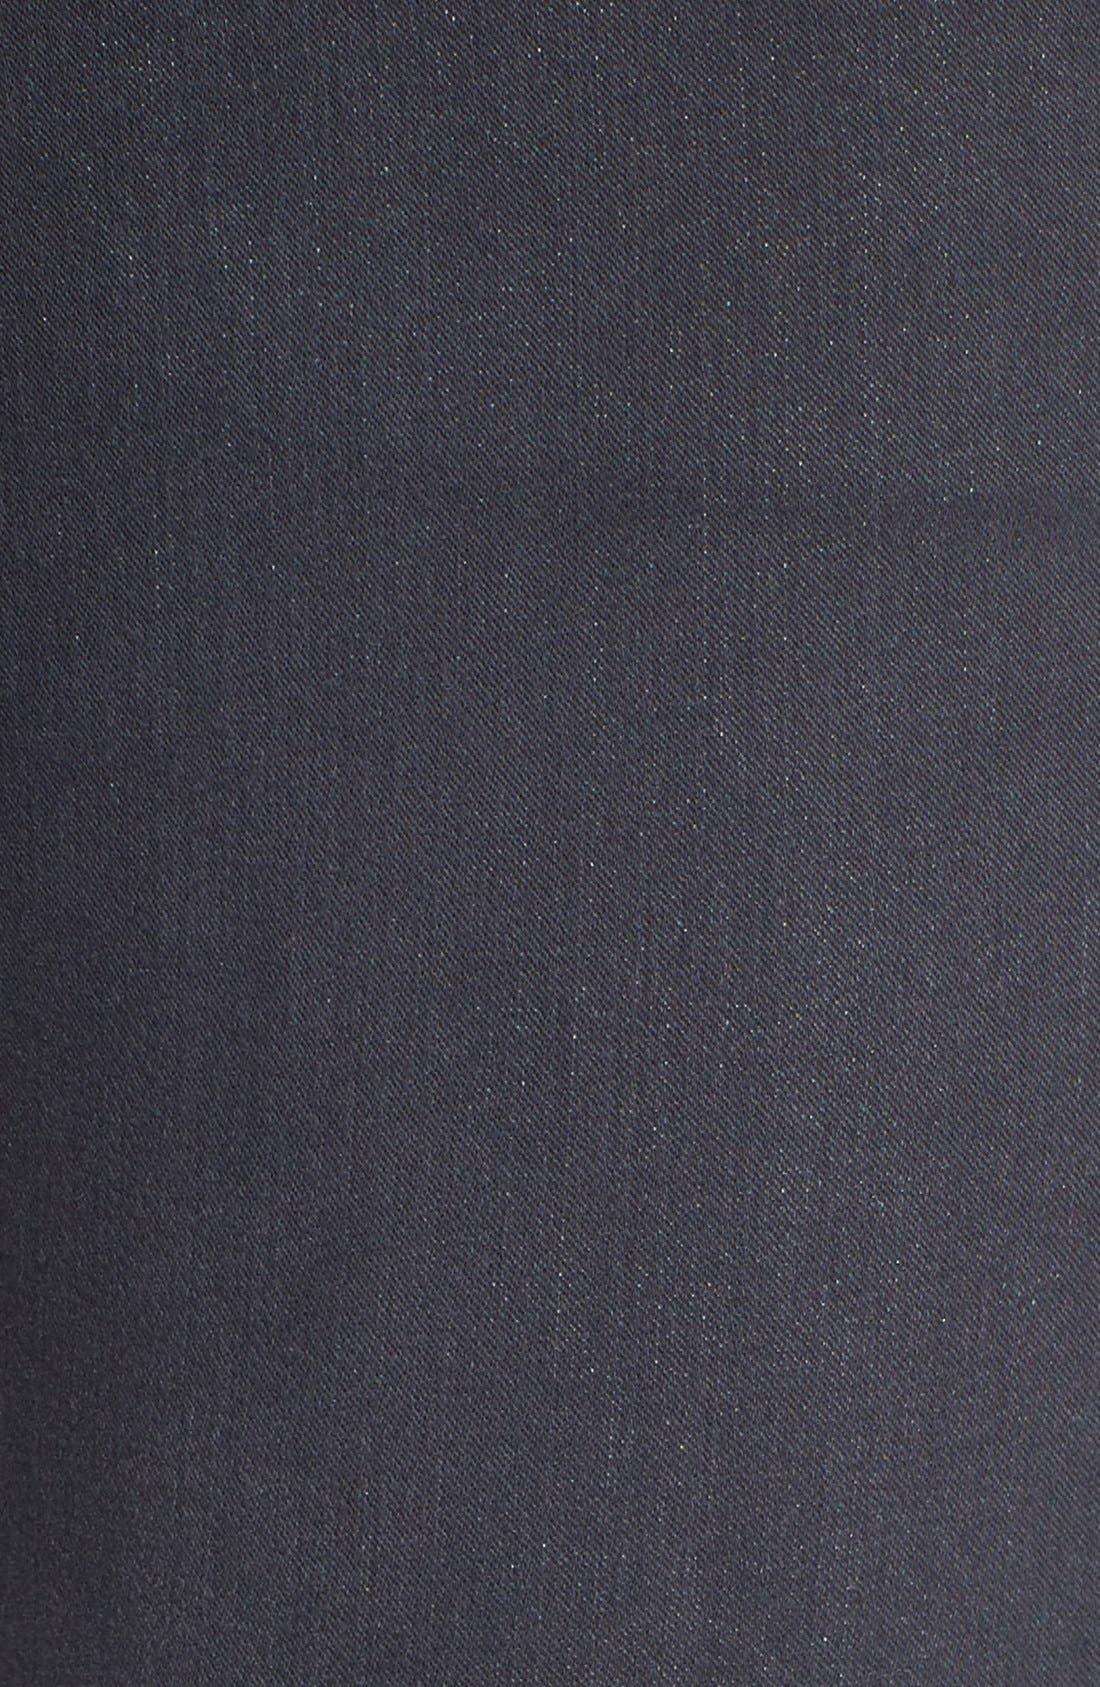 Stretch Skinny Jeans,                             Alternate thumbnail 5, color,                             Vapor Grey